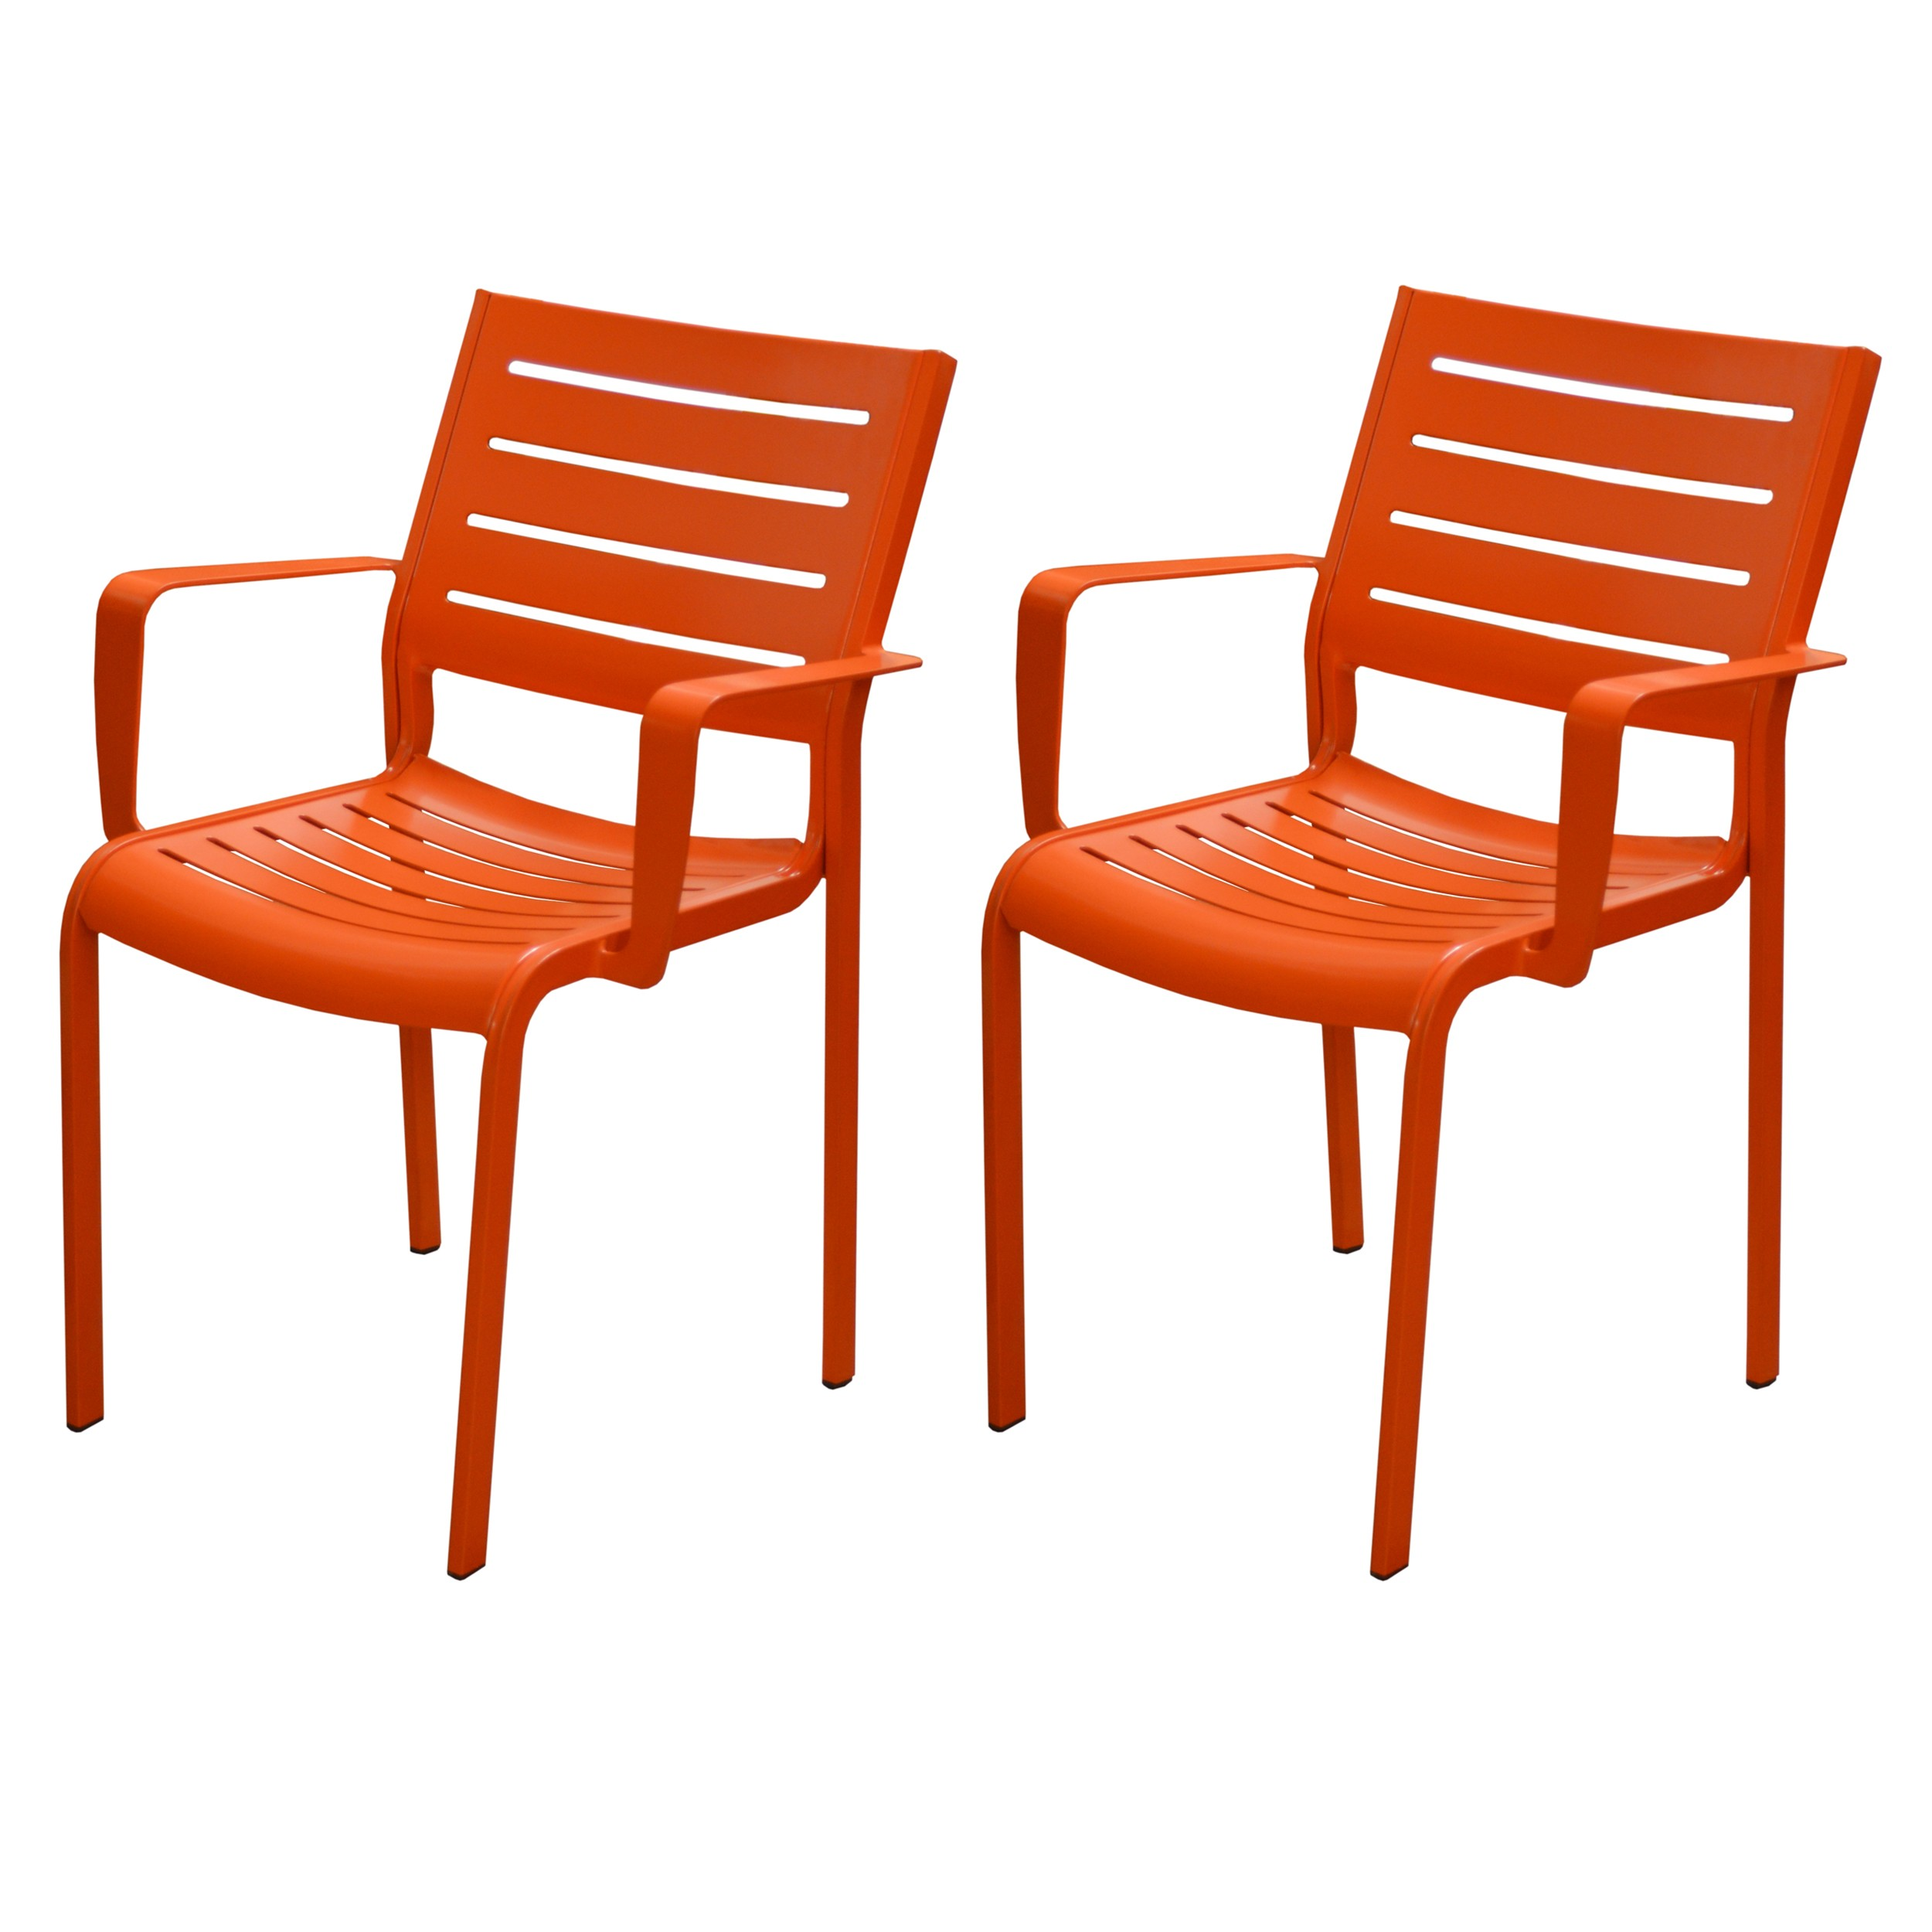 Fauteuil Isla orange : découvrez nos fauteuils Isla orange design ...